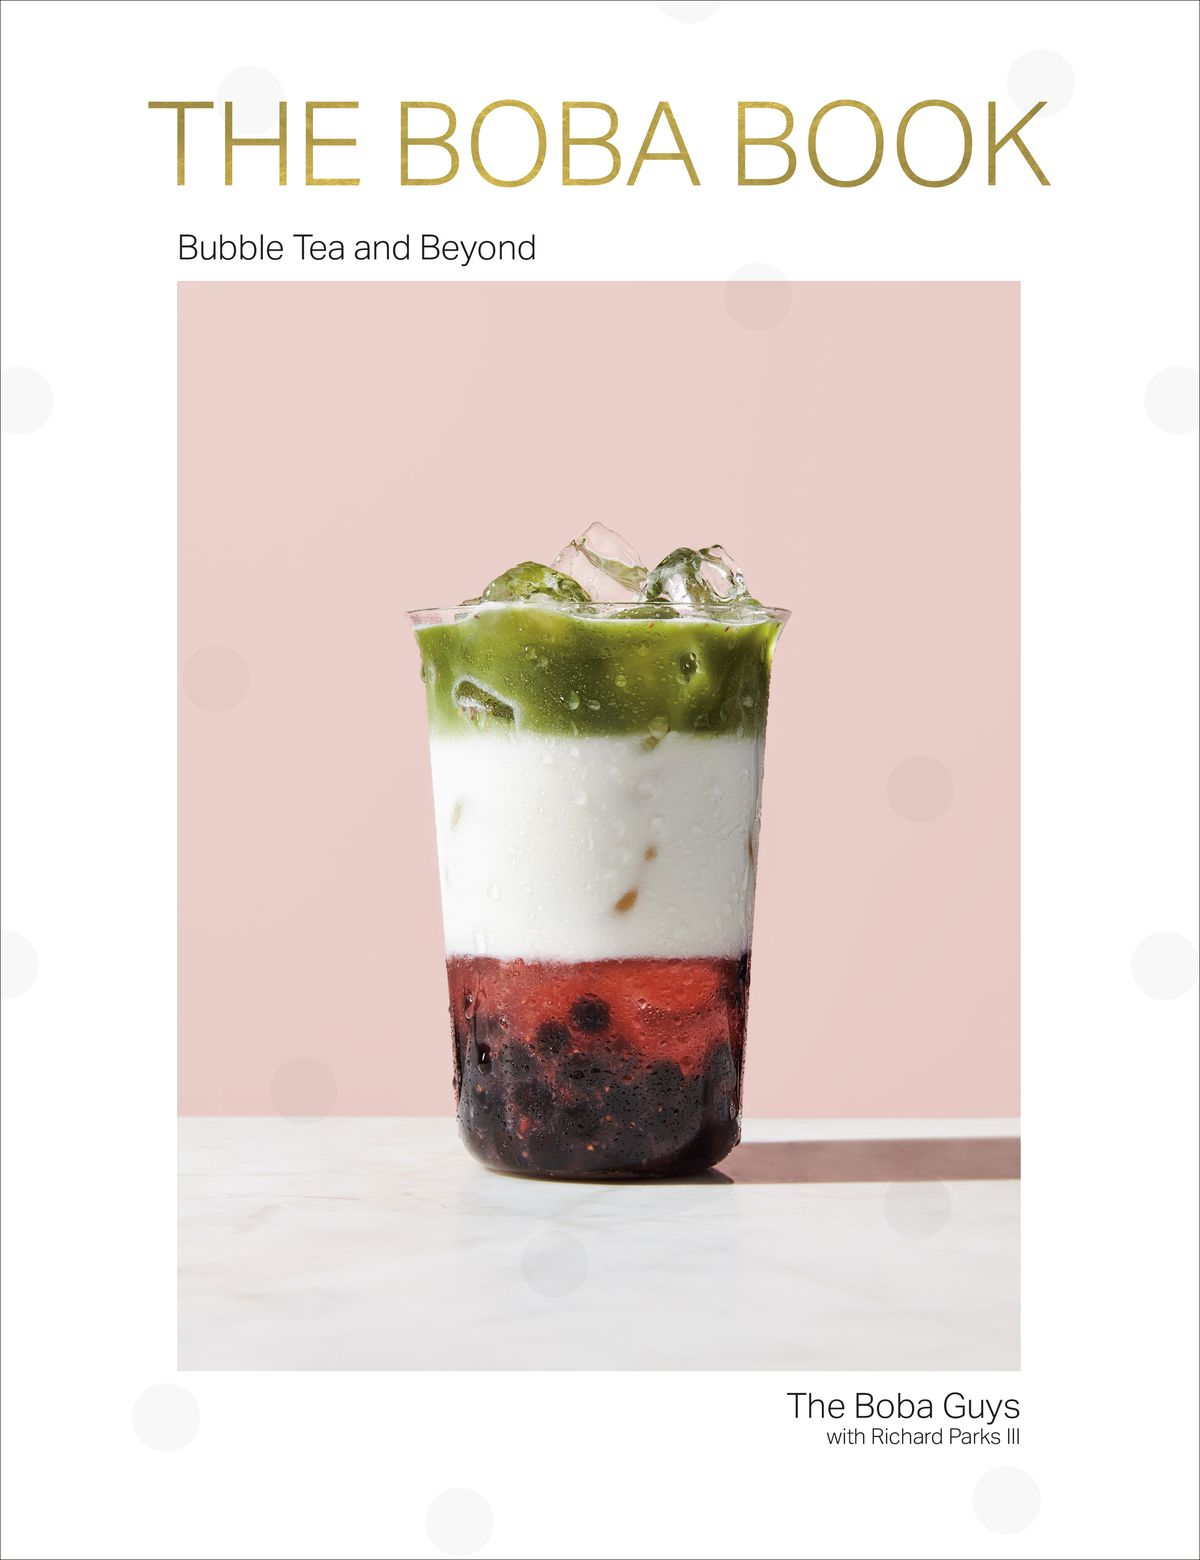 The Boba Book cover